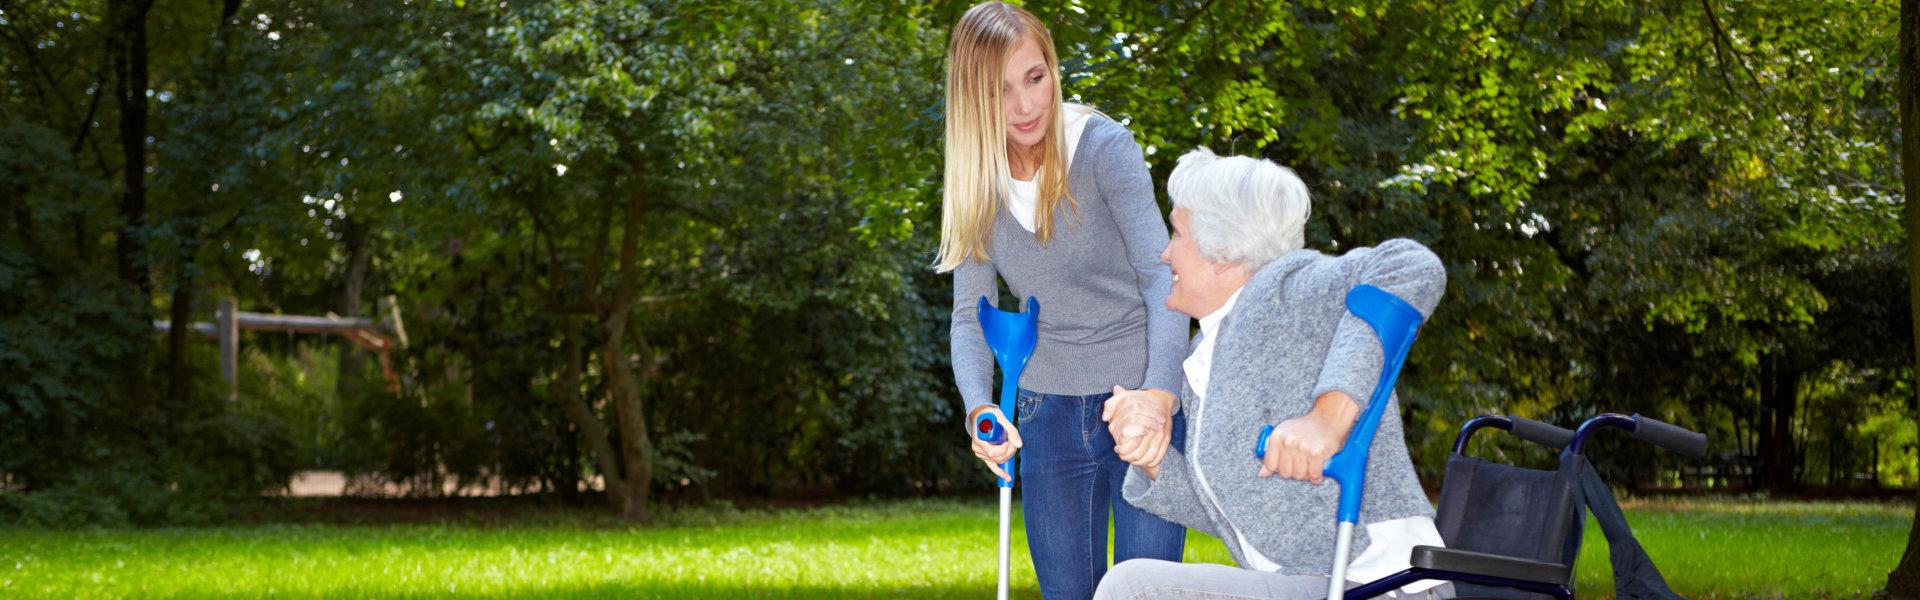 caretaker assisting an elderly woman